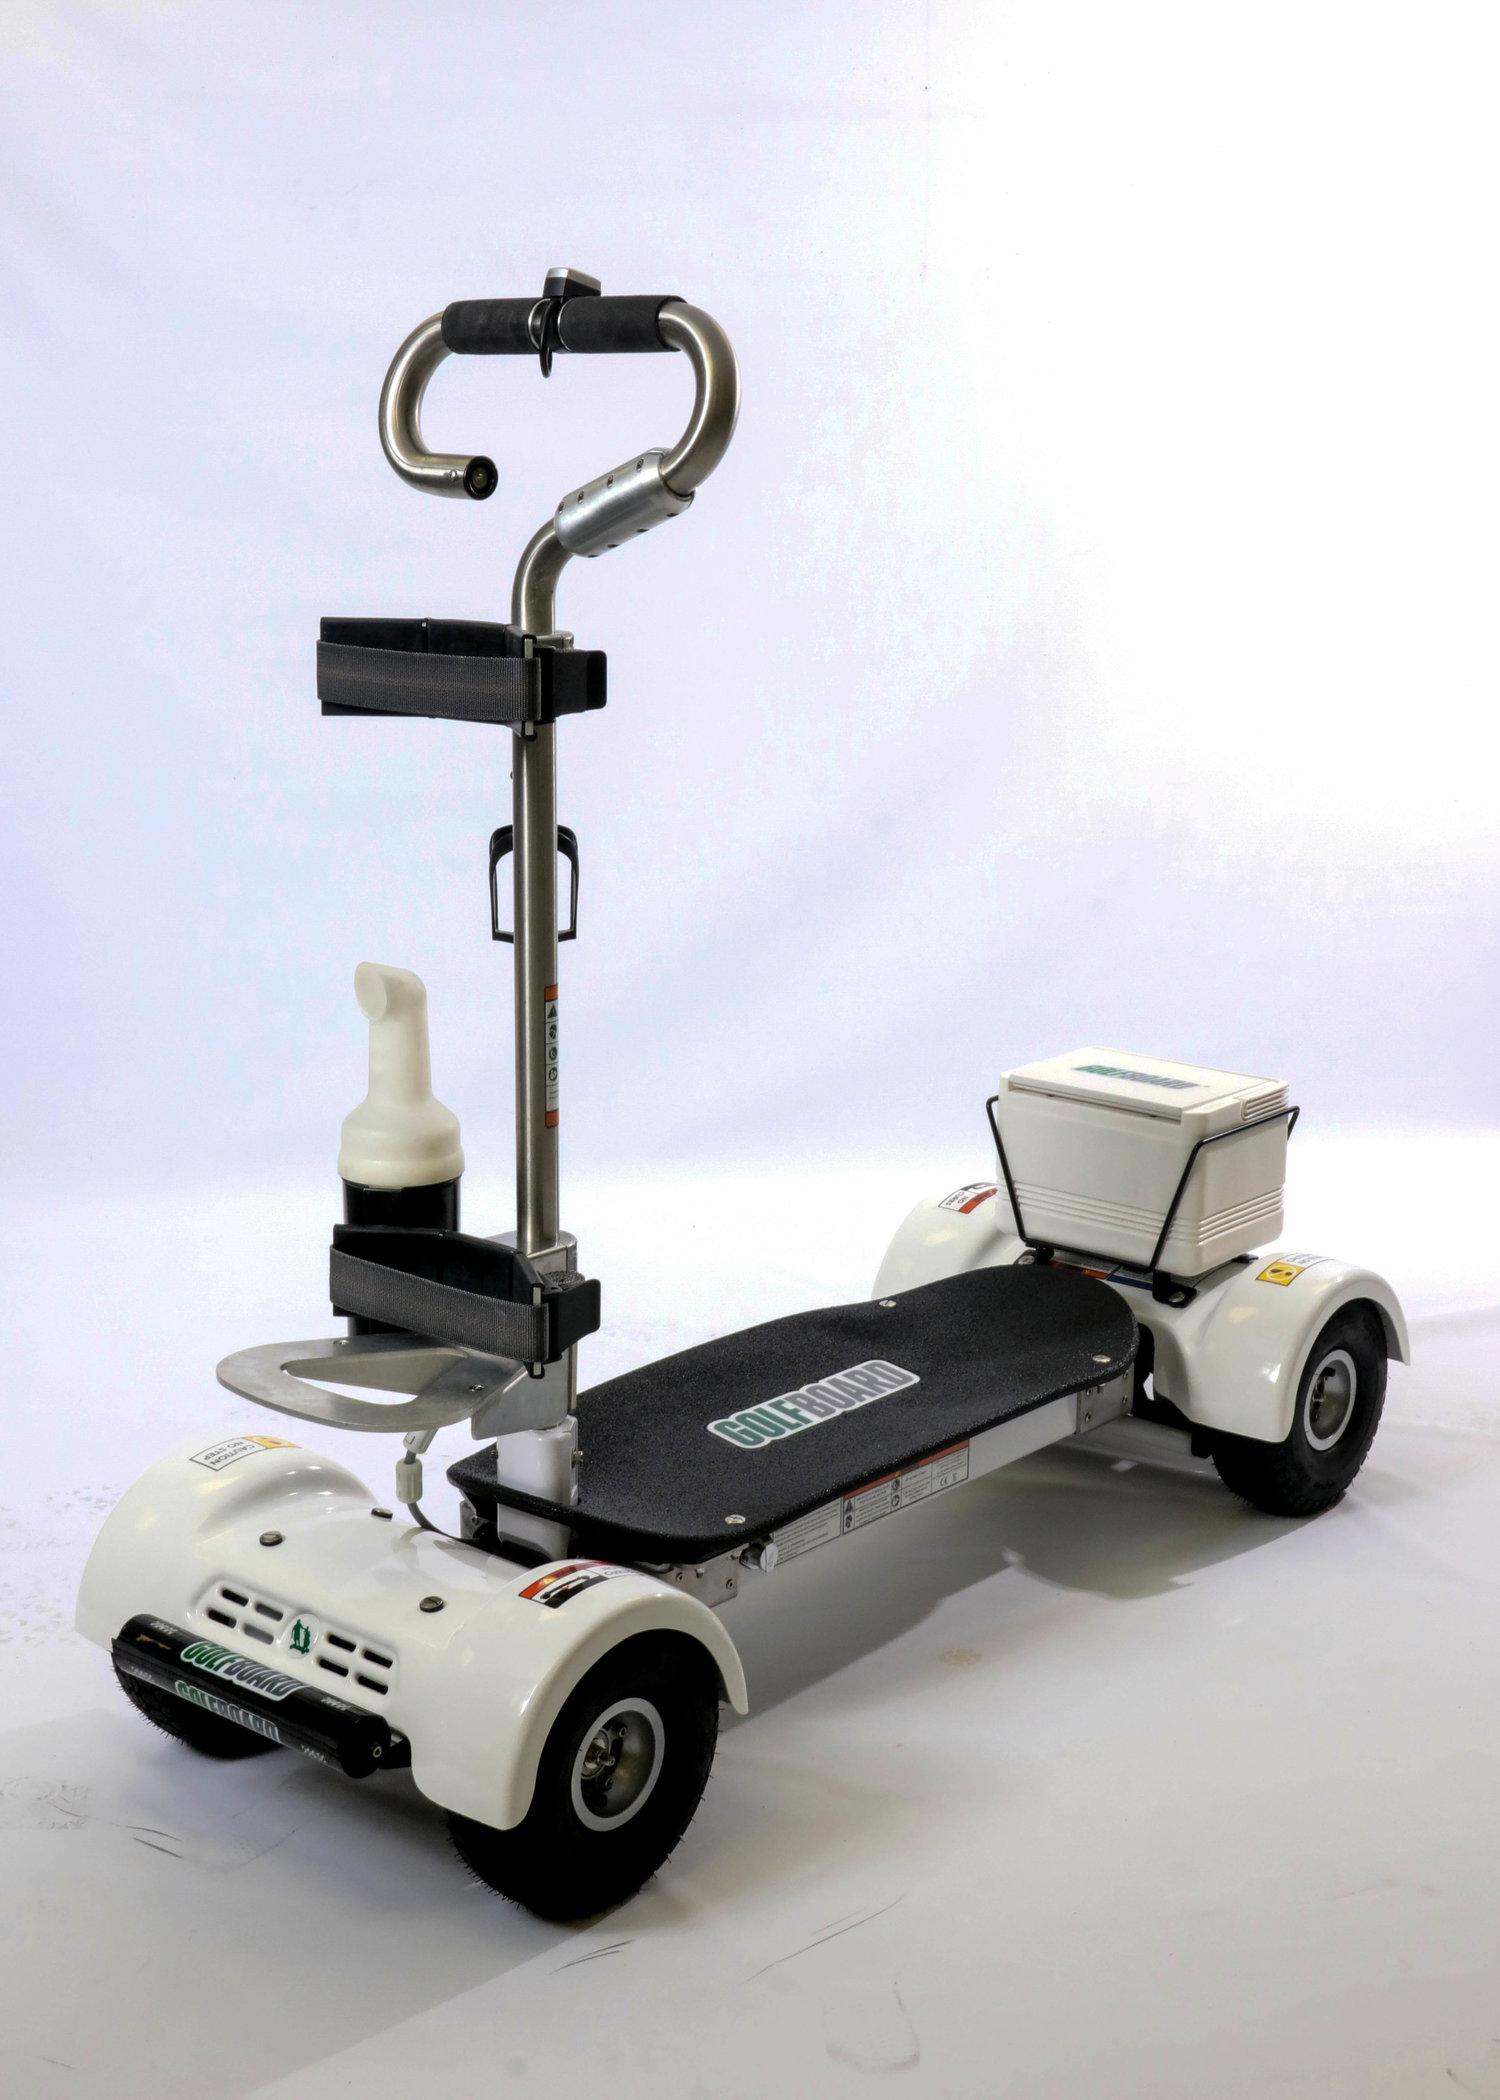 GolfBoard - 2018 Model — GolfBoard on paintball golf cart, industrial golf cart, fish golf cart, bike golf cart, junior golf cart, board golf cart, football golf cart, wood golf cart, gopro golf cart, snow golf cart, motorized skateboard golf cart, egg golf cart, fun golf cart, gun golf cart, girls golf cart, cruiser golf cart, surfing golf cart, sunset golf cart, retro golf cart, speed golf cart,